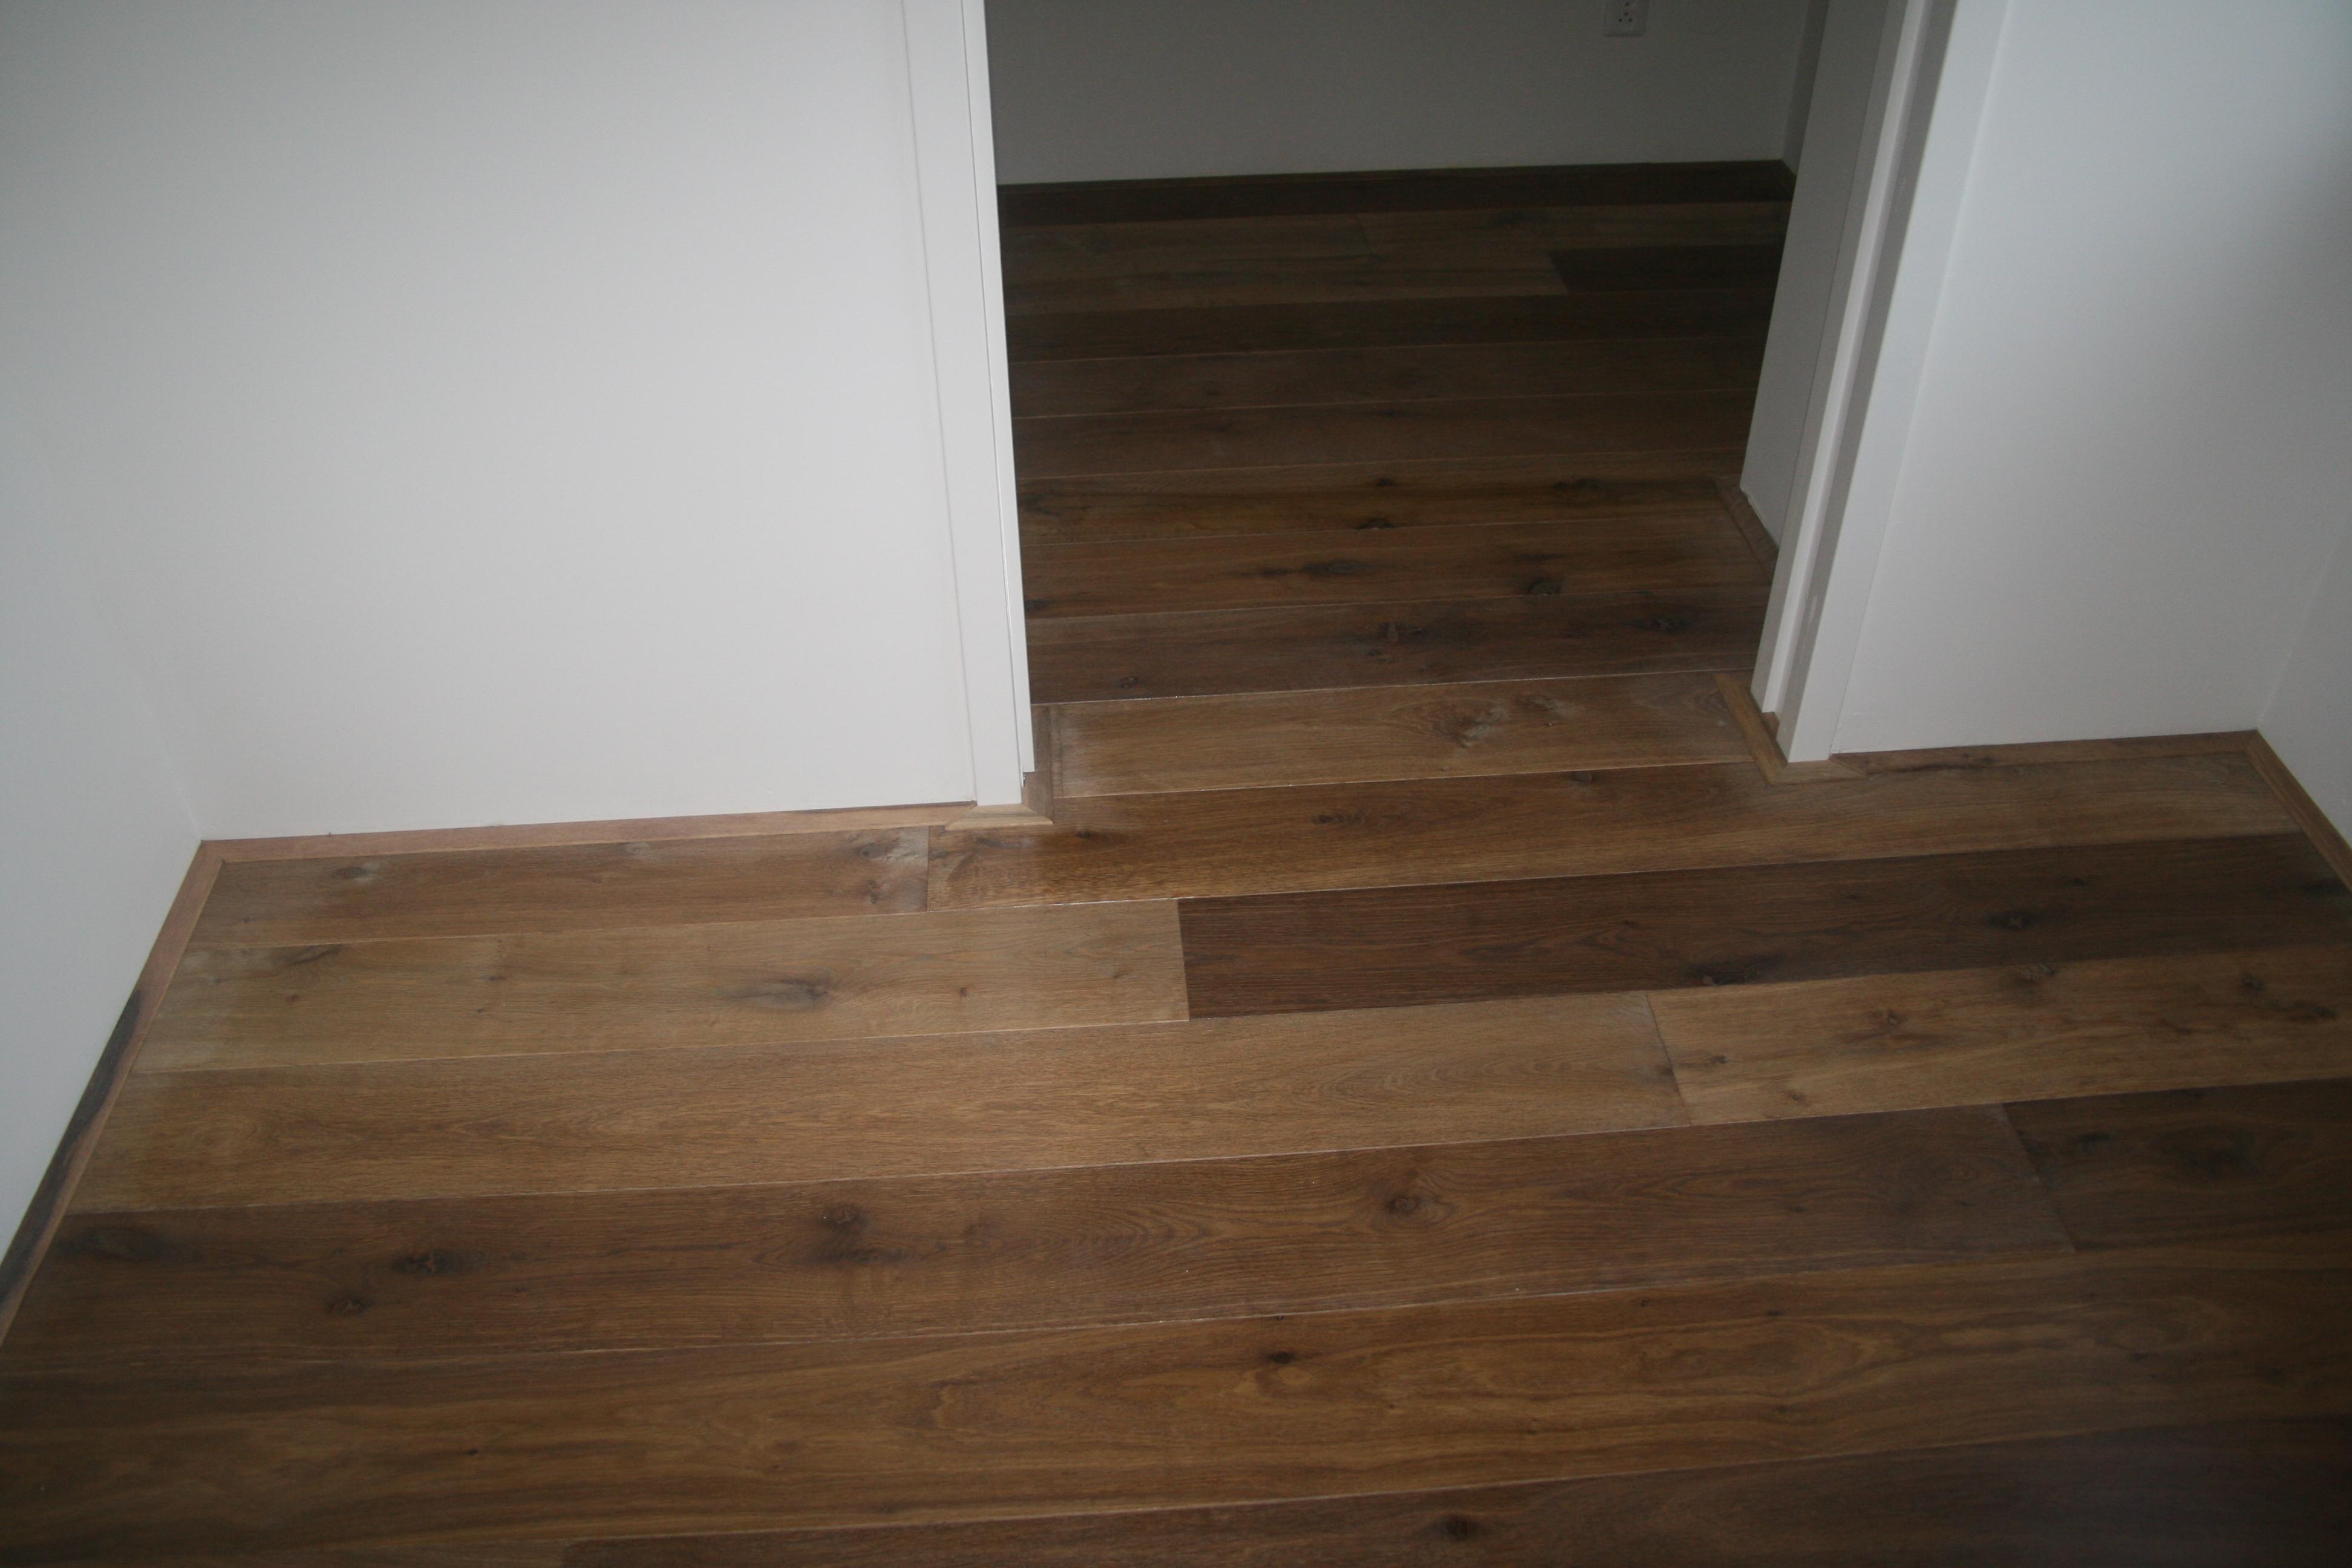 parket laminaat parket houten vloeren lamelparket